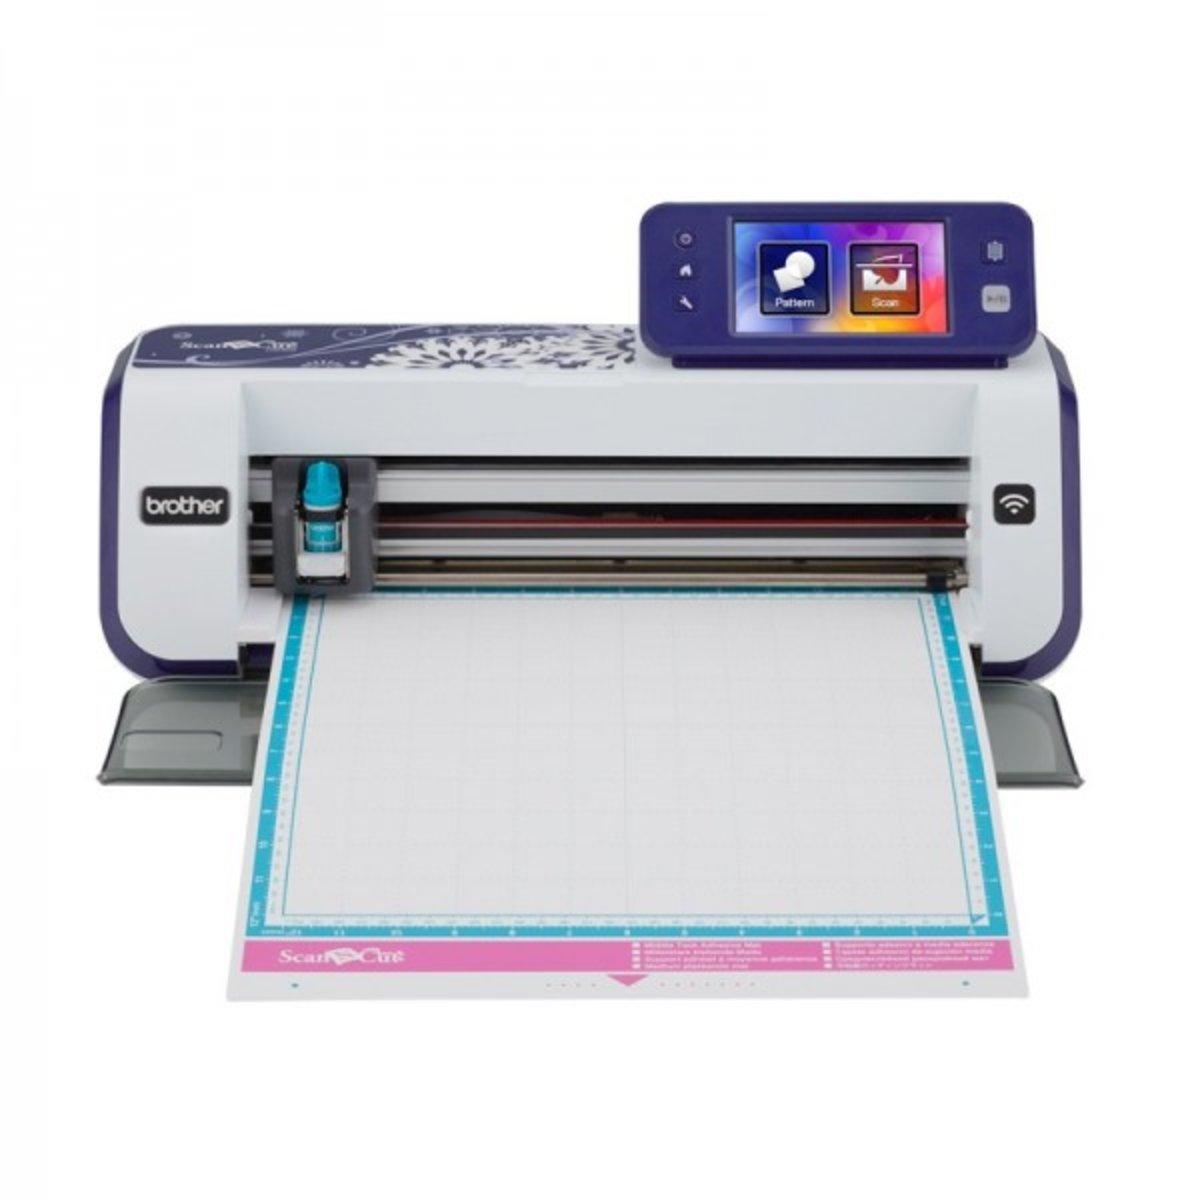 Advanced Cutting Machine CM900 ScanNCut  Home & Hobby